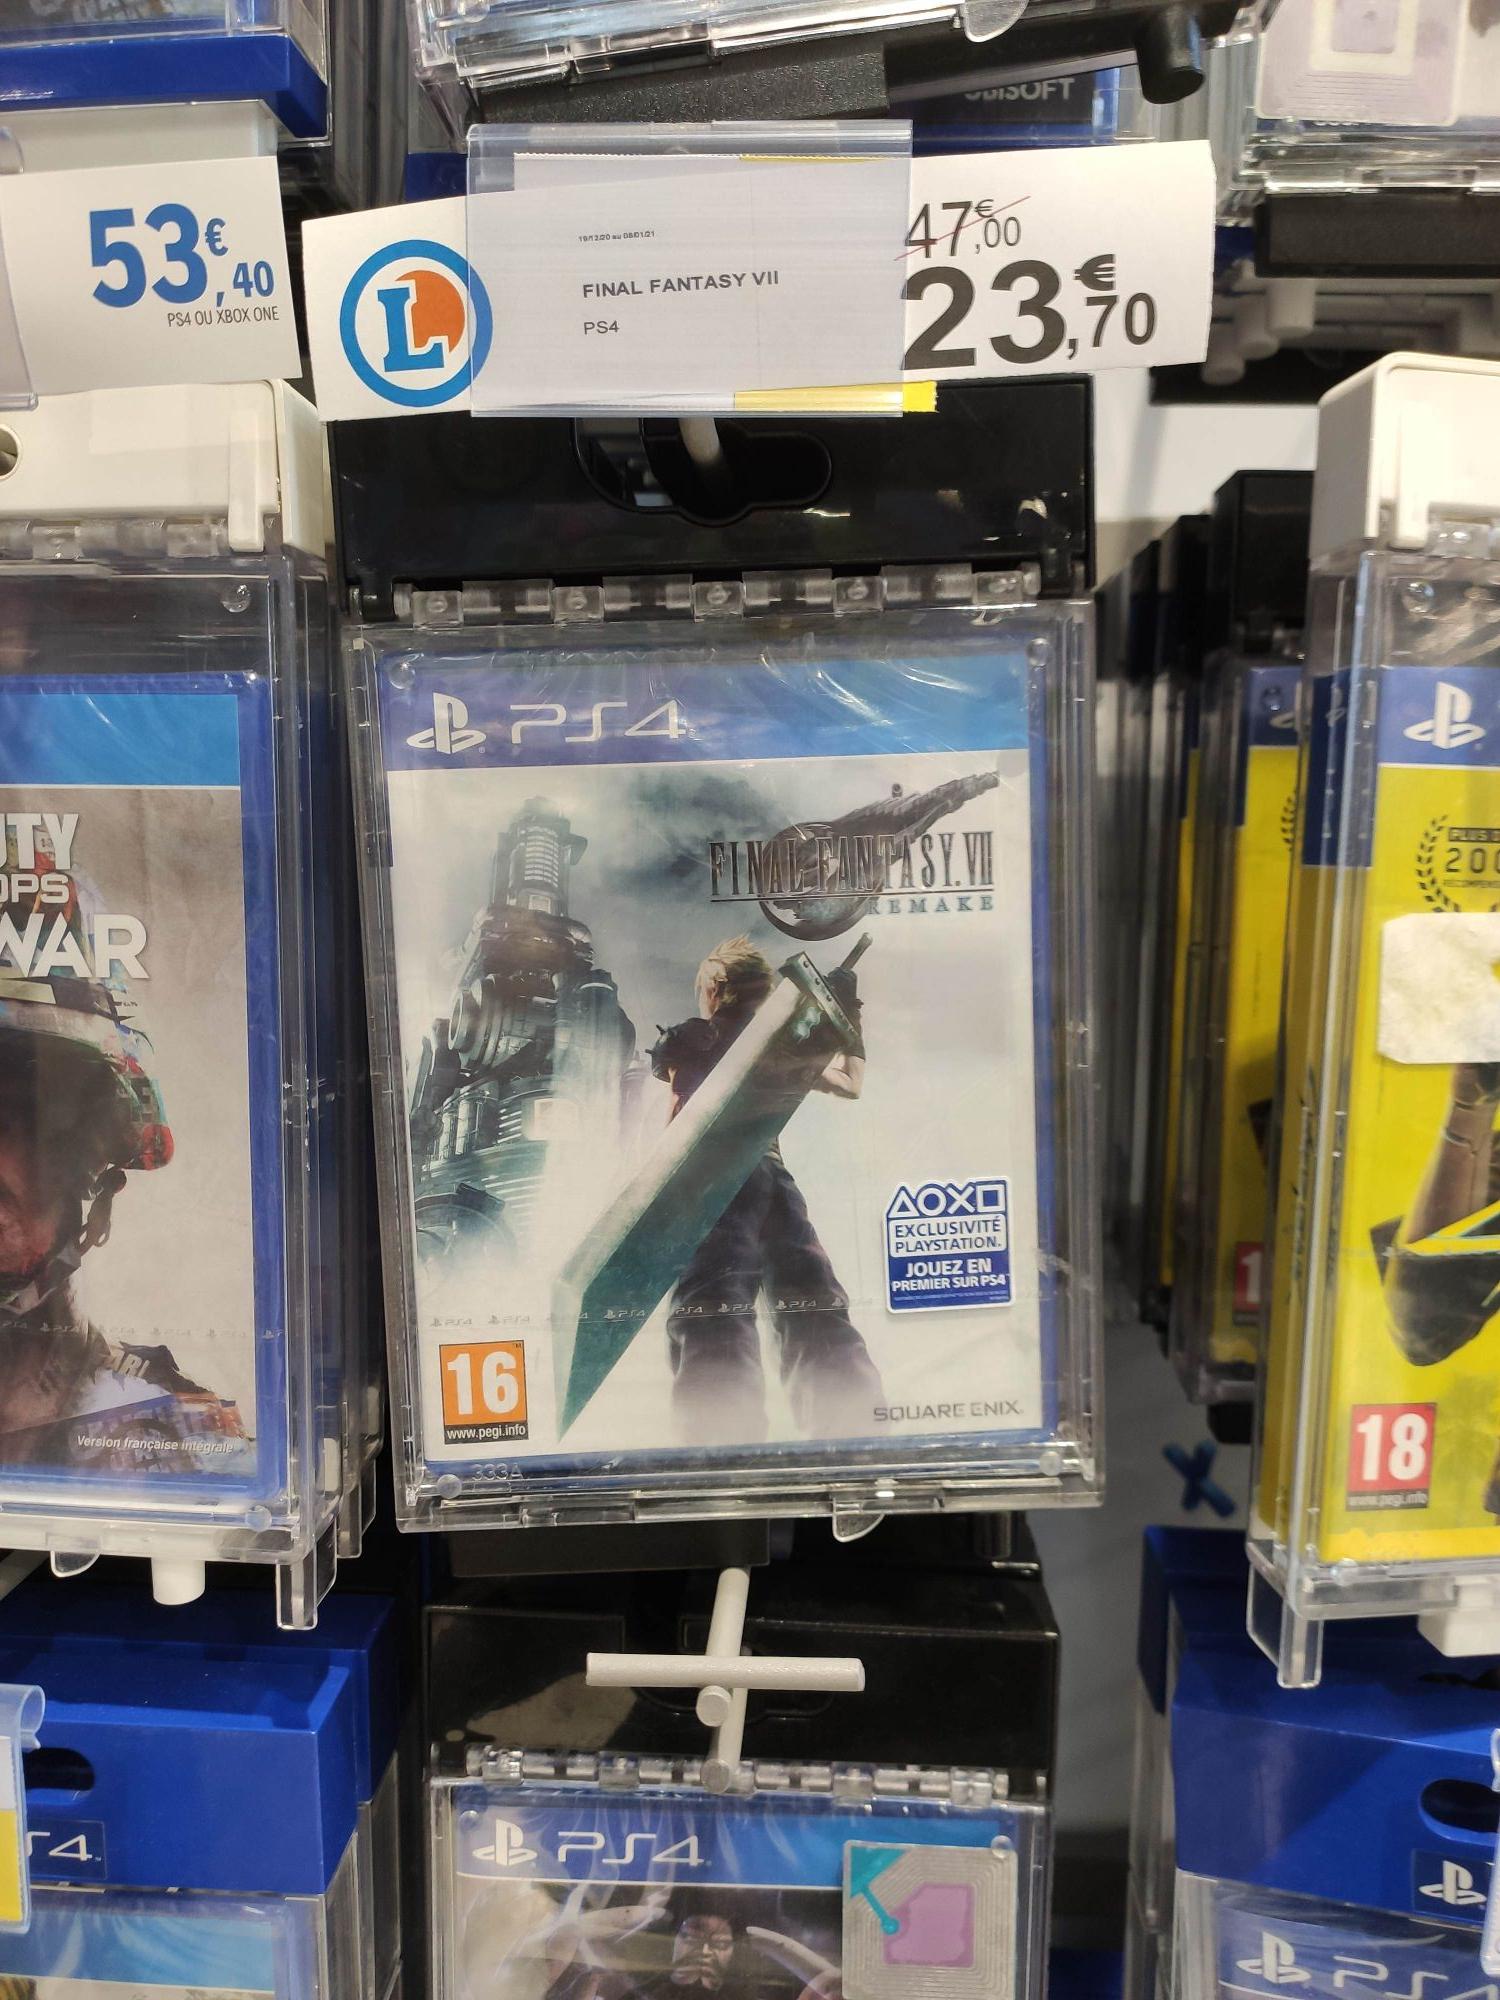 Final Fantasy VII Remake sur PS4 - Bellaing (59)